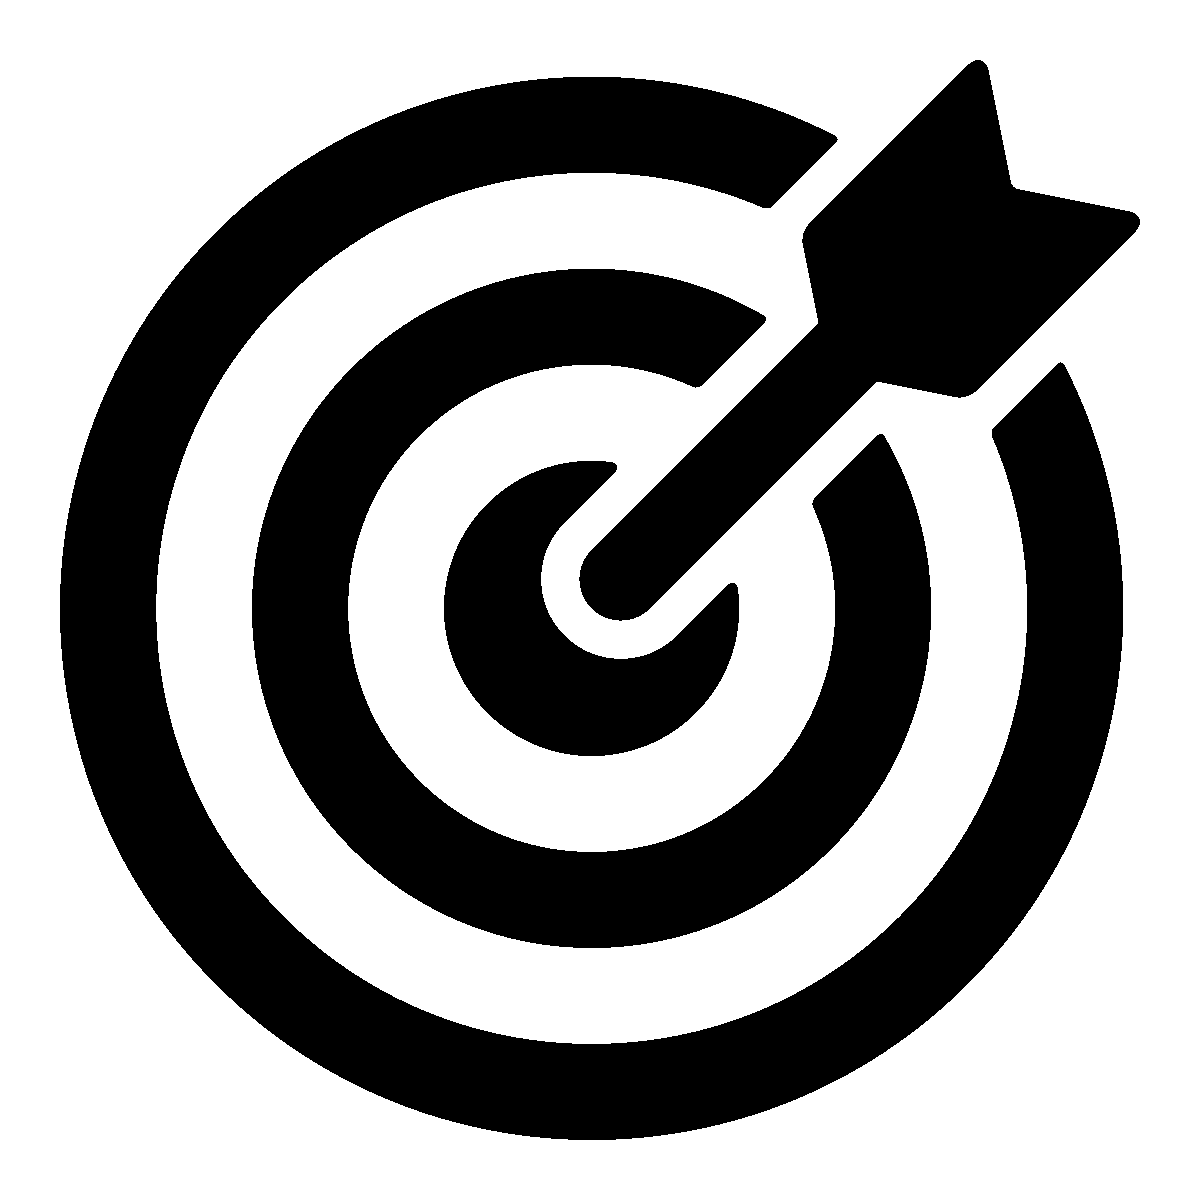 output-onlinepngtools (2)